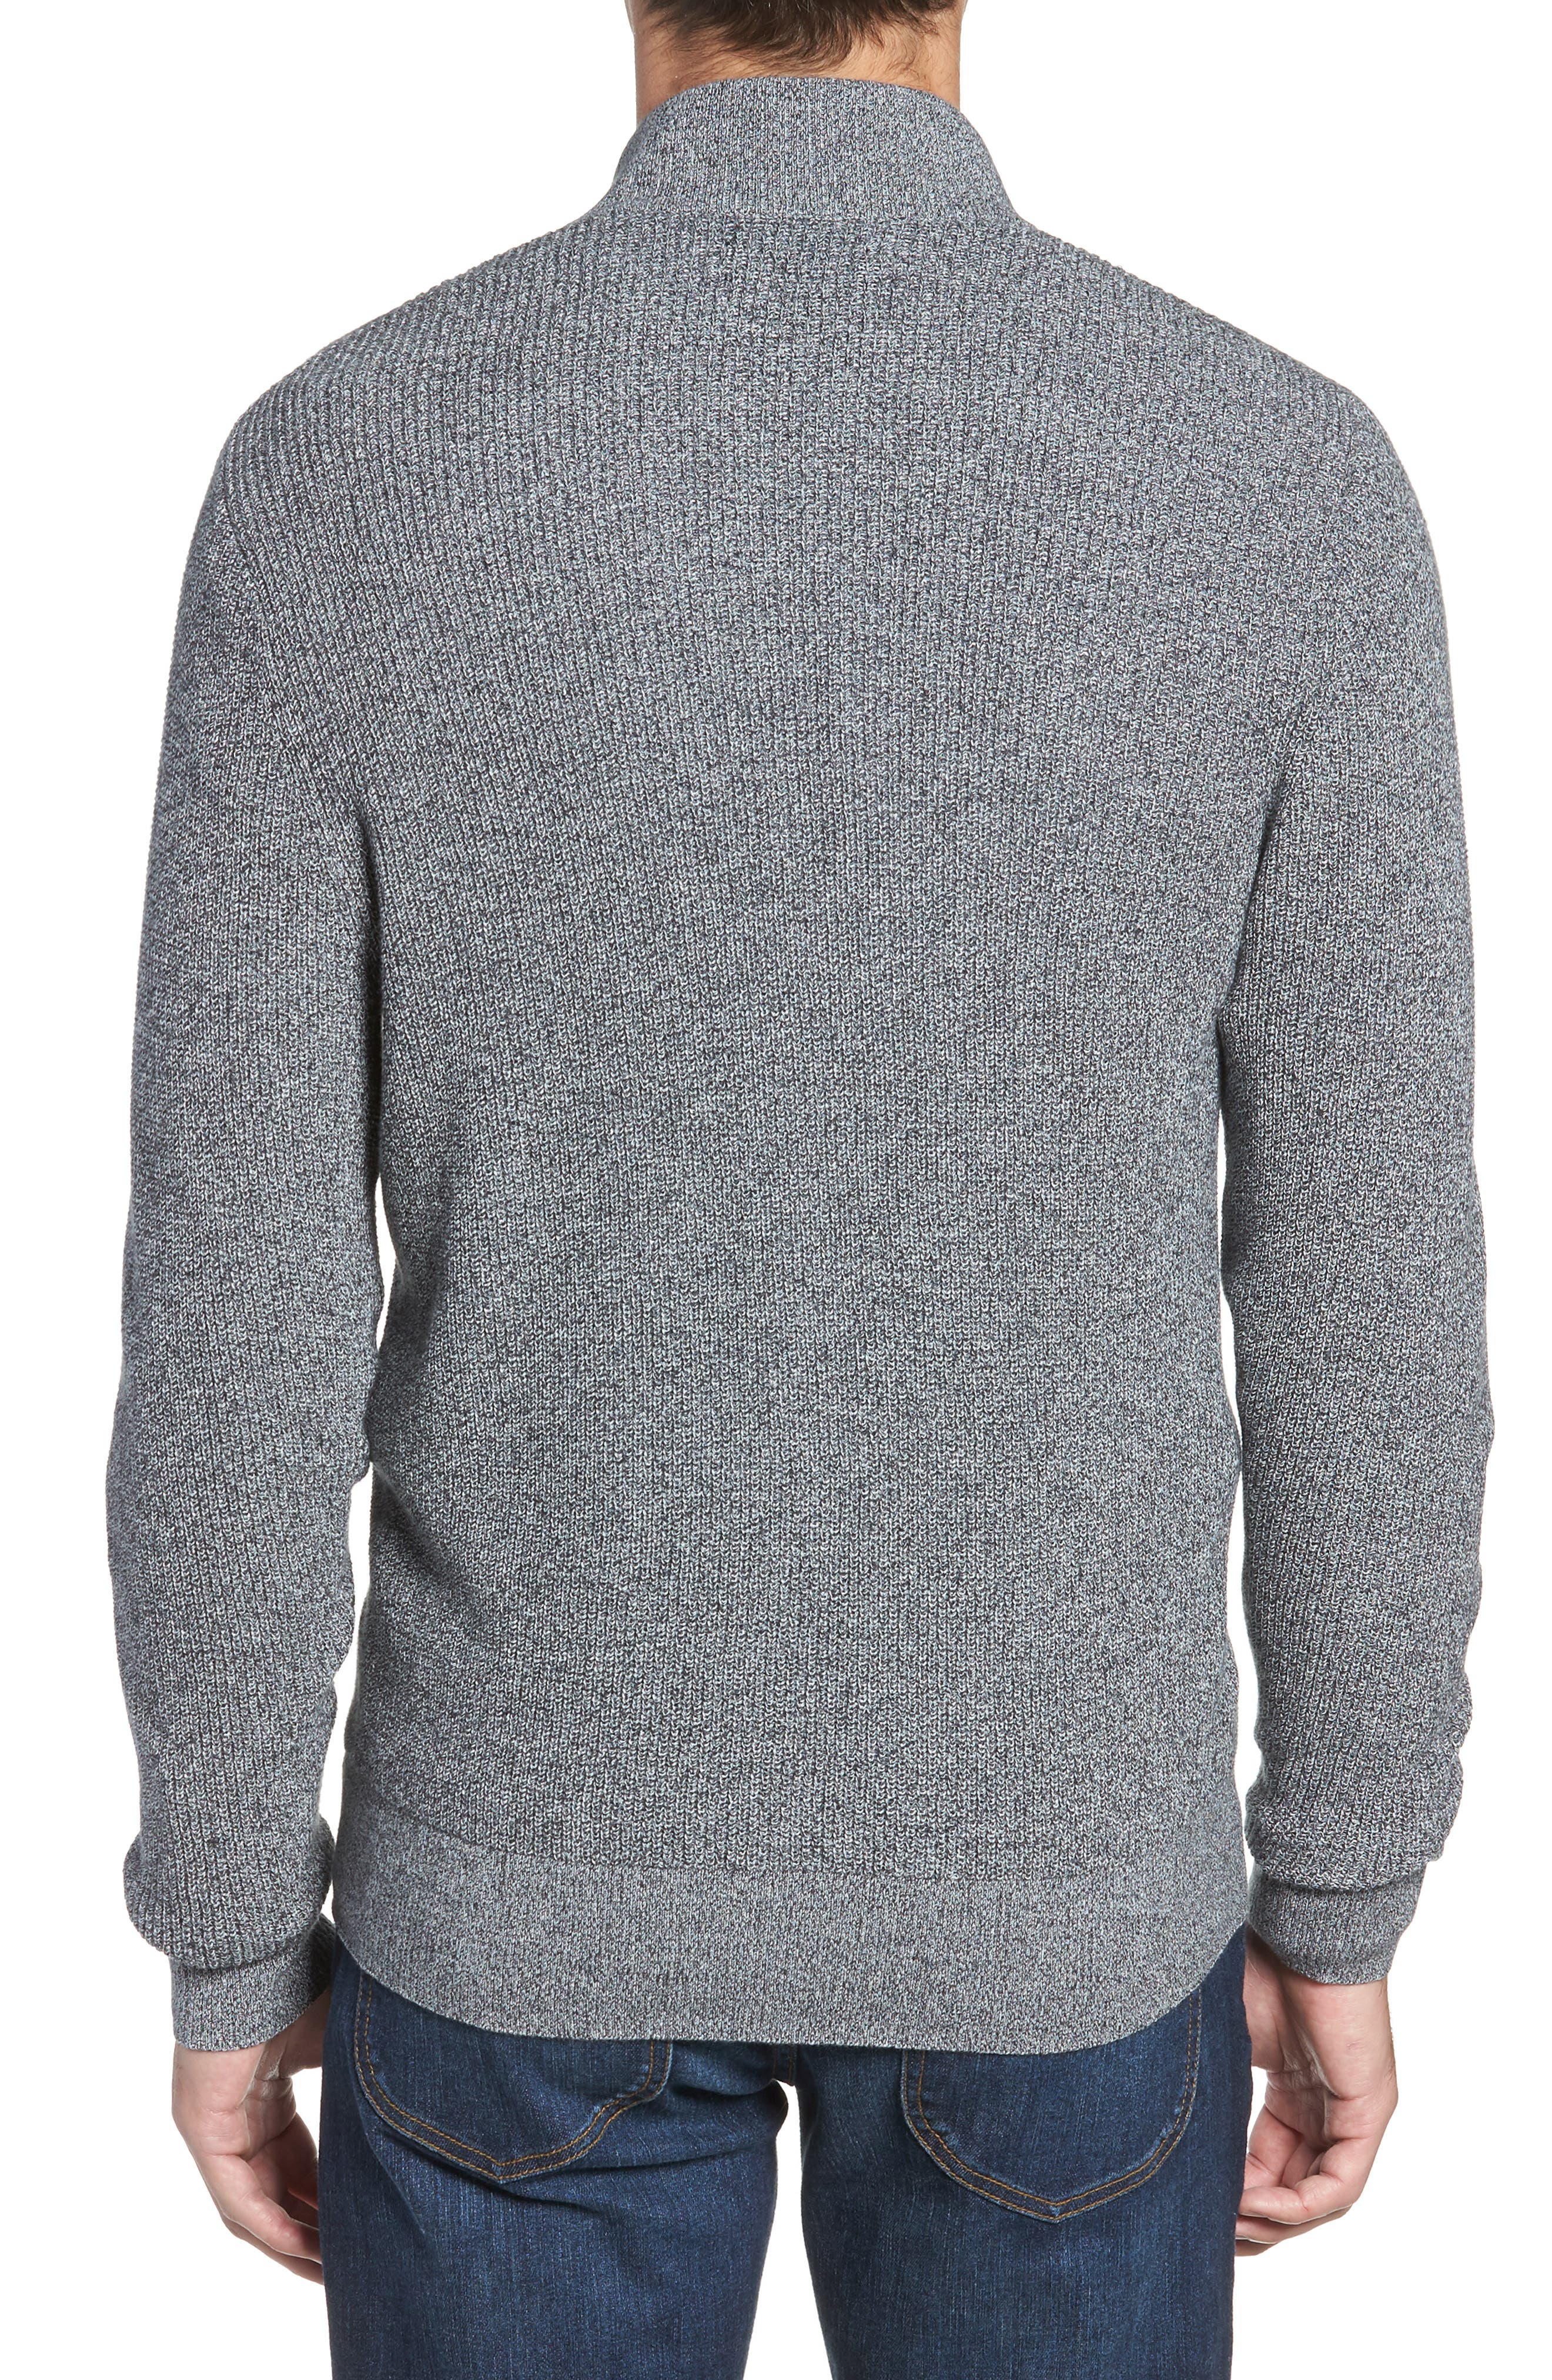 Marled Mock Neck Zip Sweater,                             Alternate thumbnail 2, color,                             BLACK IVORY MARL